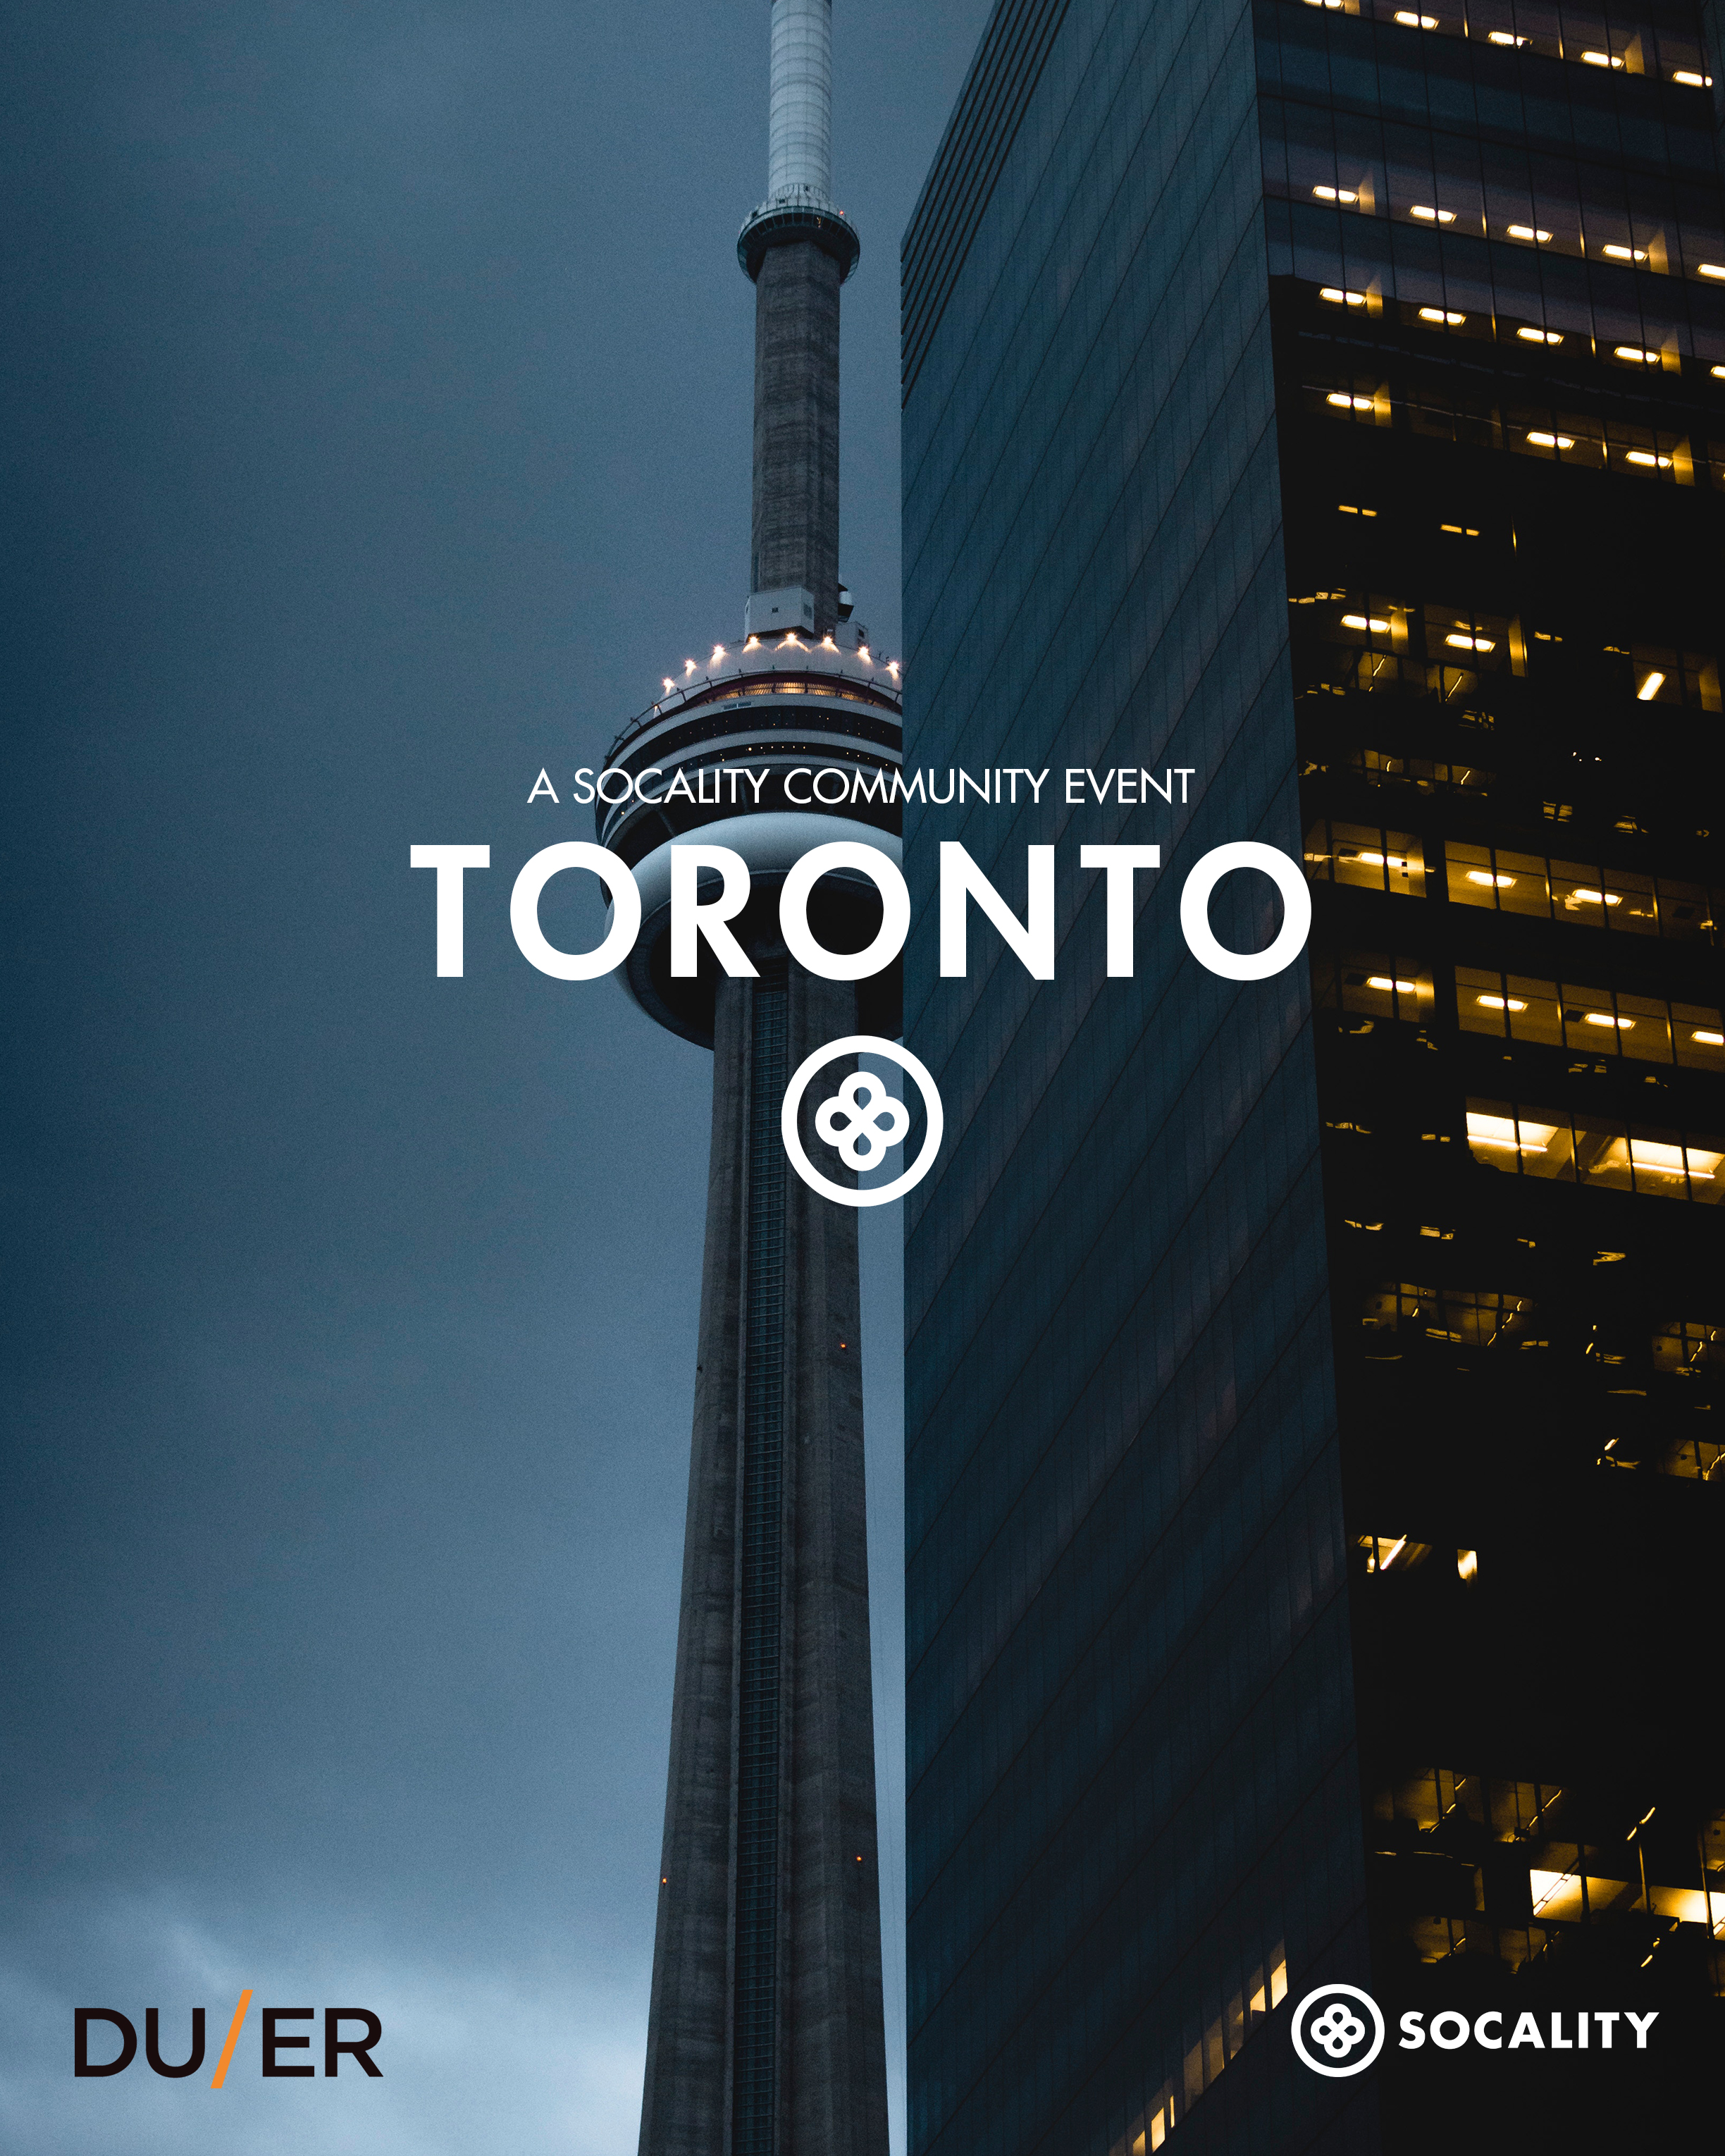 Toronto_4x5_Eventbrite.jpg